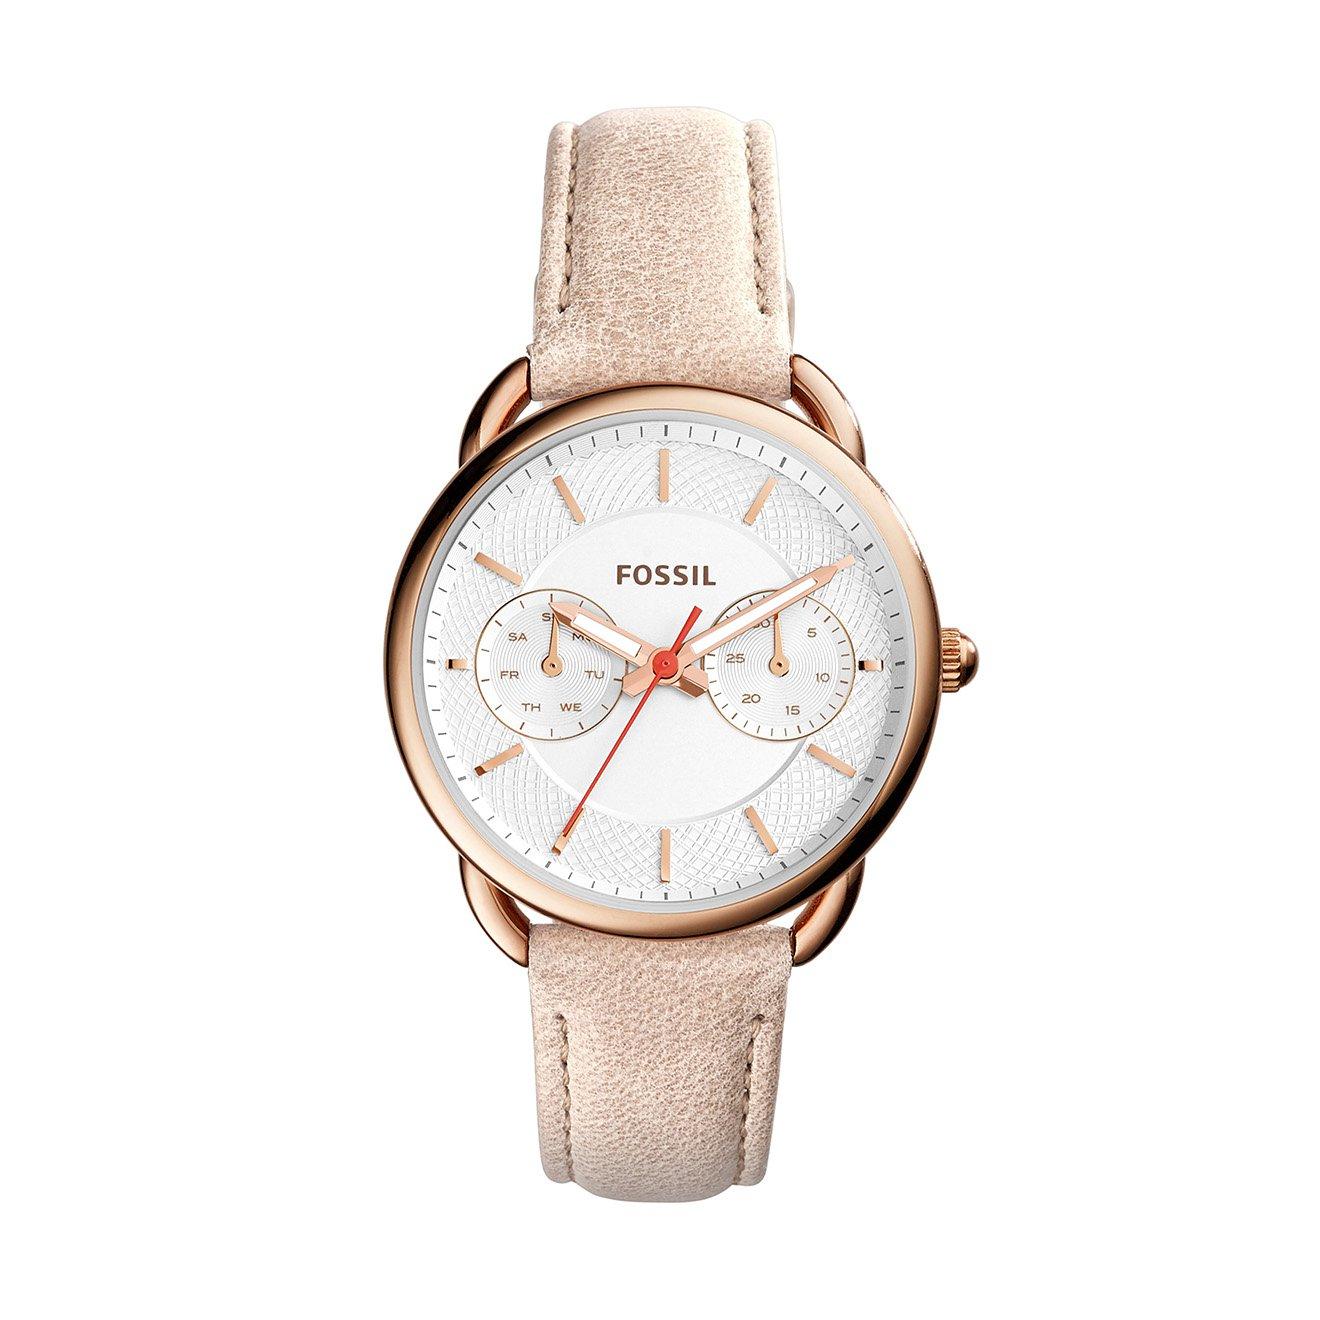 [Fossil Outlet Ochtrup] Fossil Damen Uhr ES4007